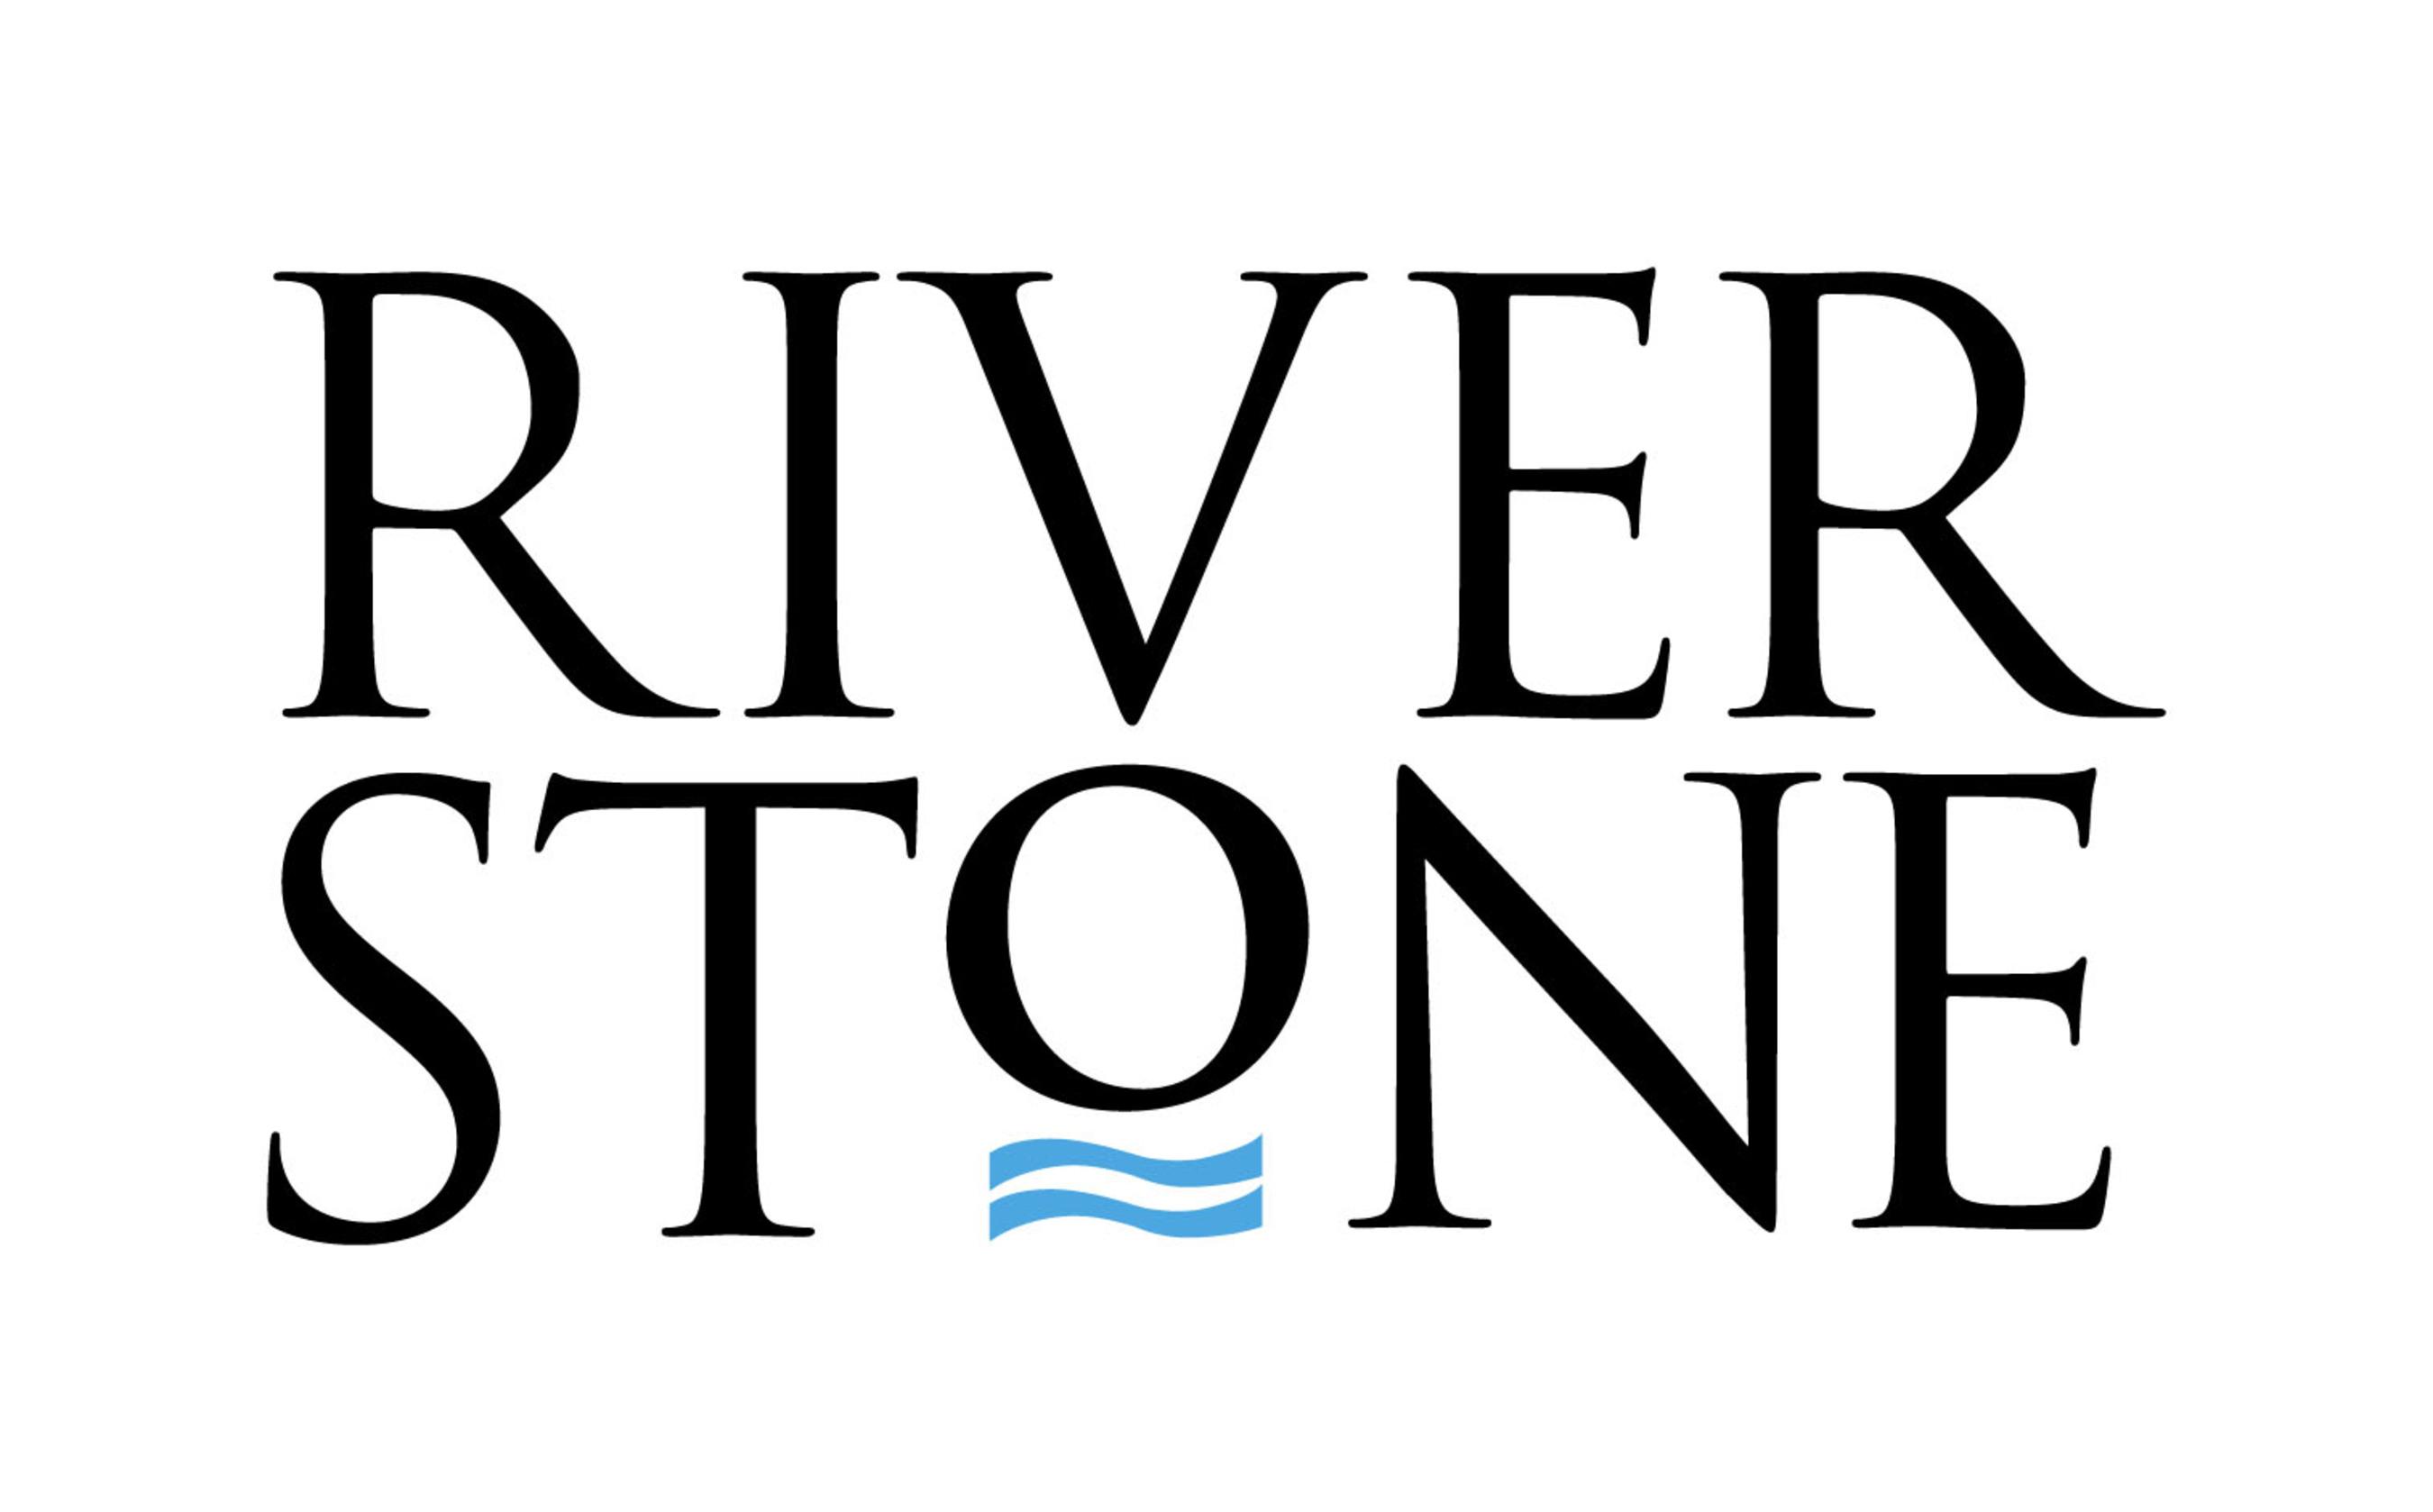 Riverstone Holdings LLC logo. (PRNewsFoto/Riverstone Holdings LLC) (PRNewsFoto/)